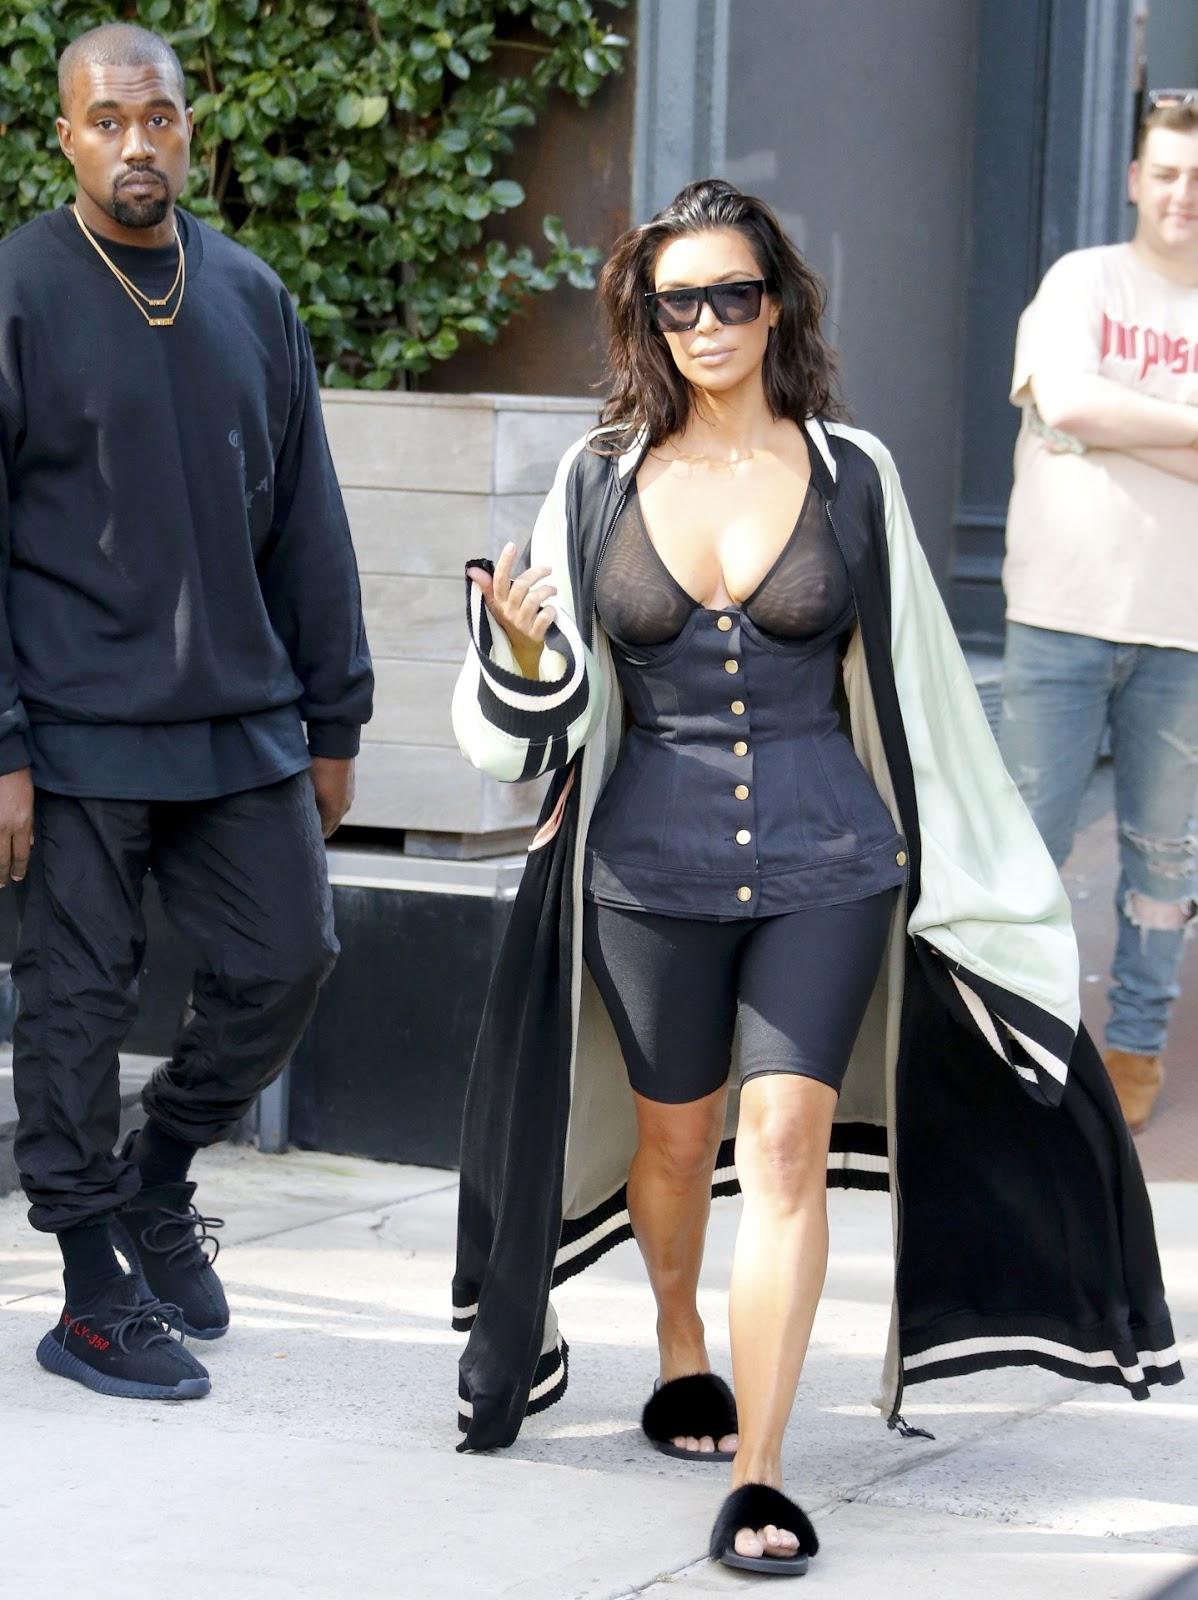 Kim Kardashian Shows Off Her Black Intimates in See